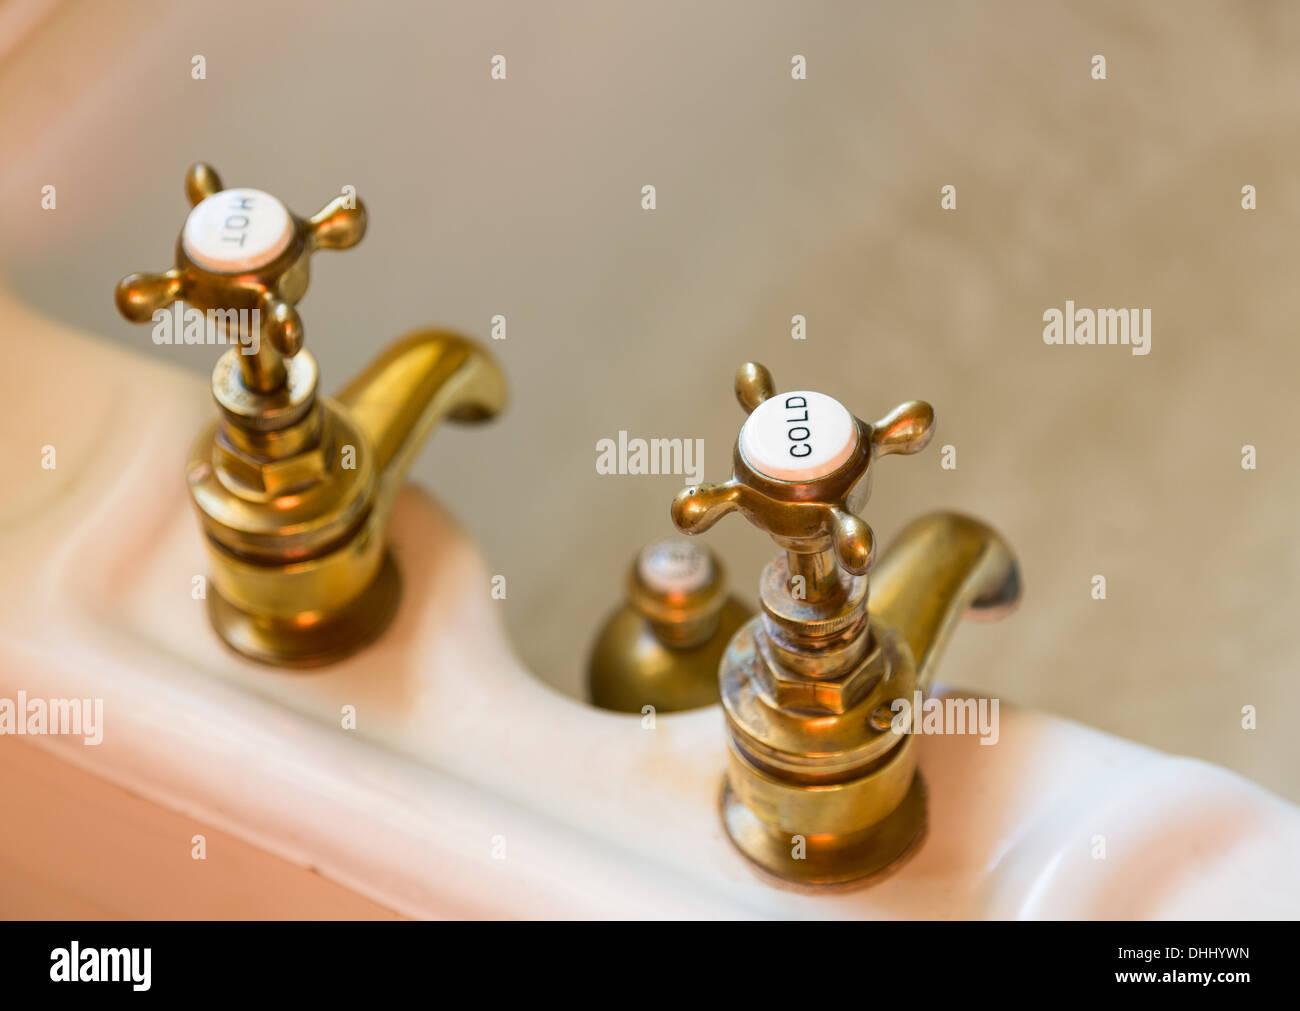 Bath Taps Stock Photos & Bath Taps Stock Images - Alamy